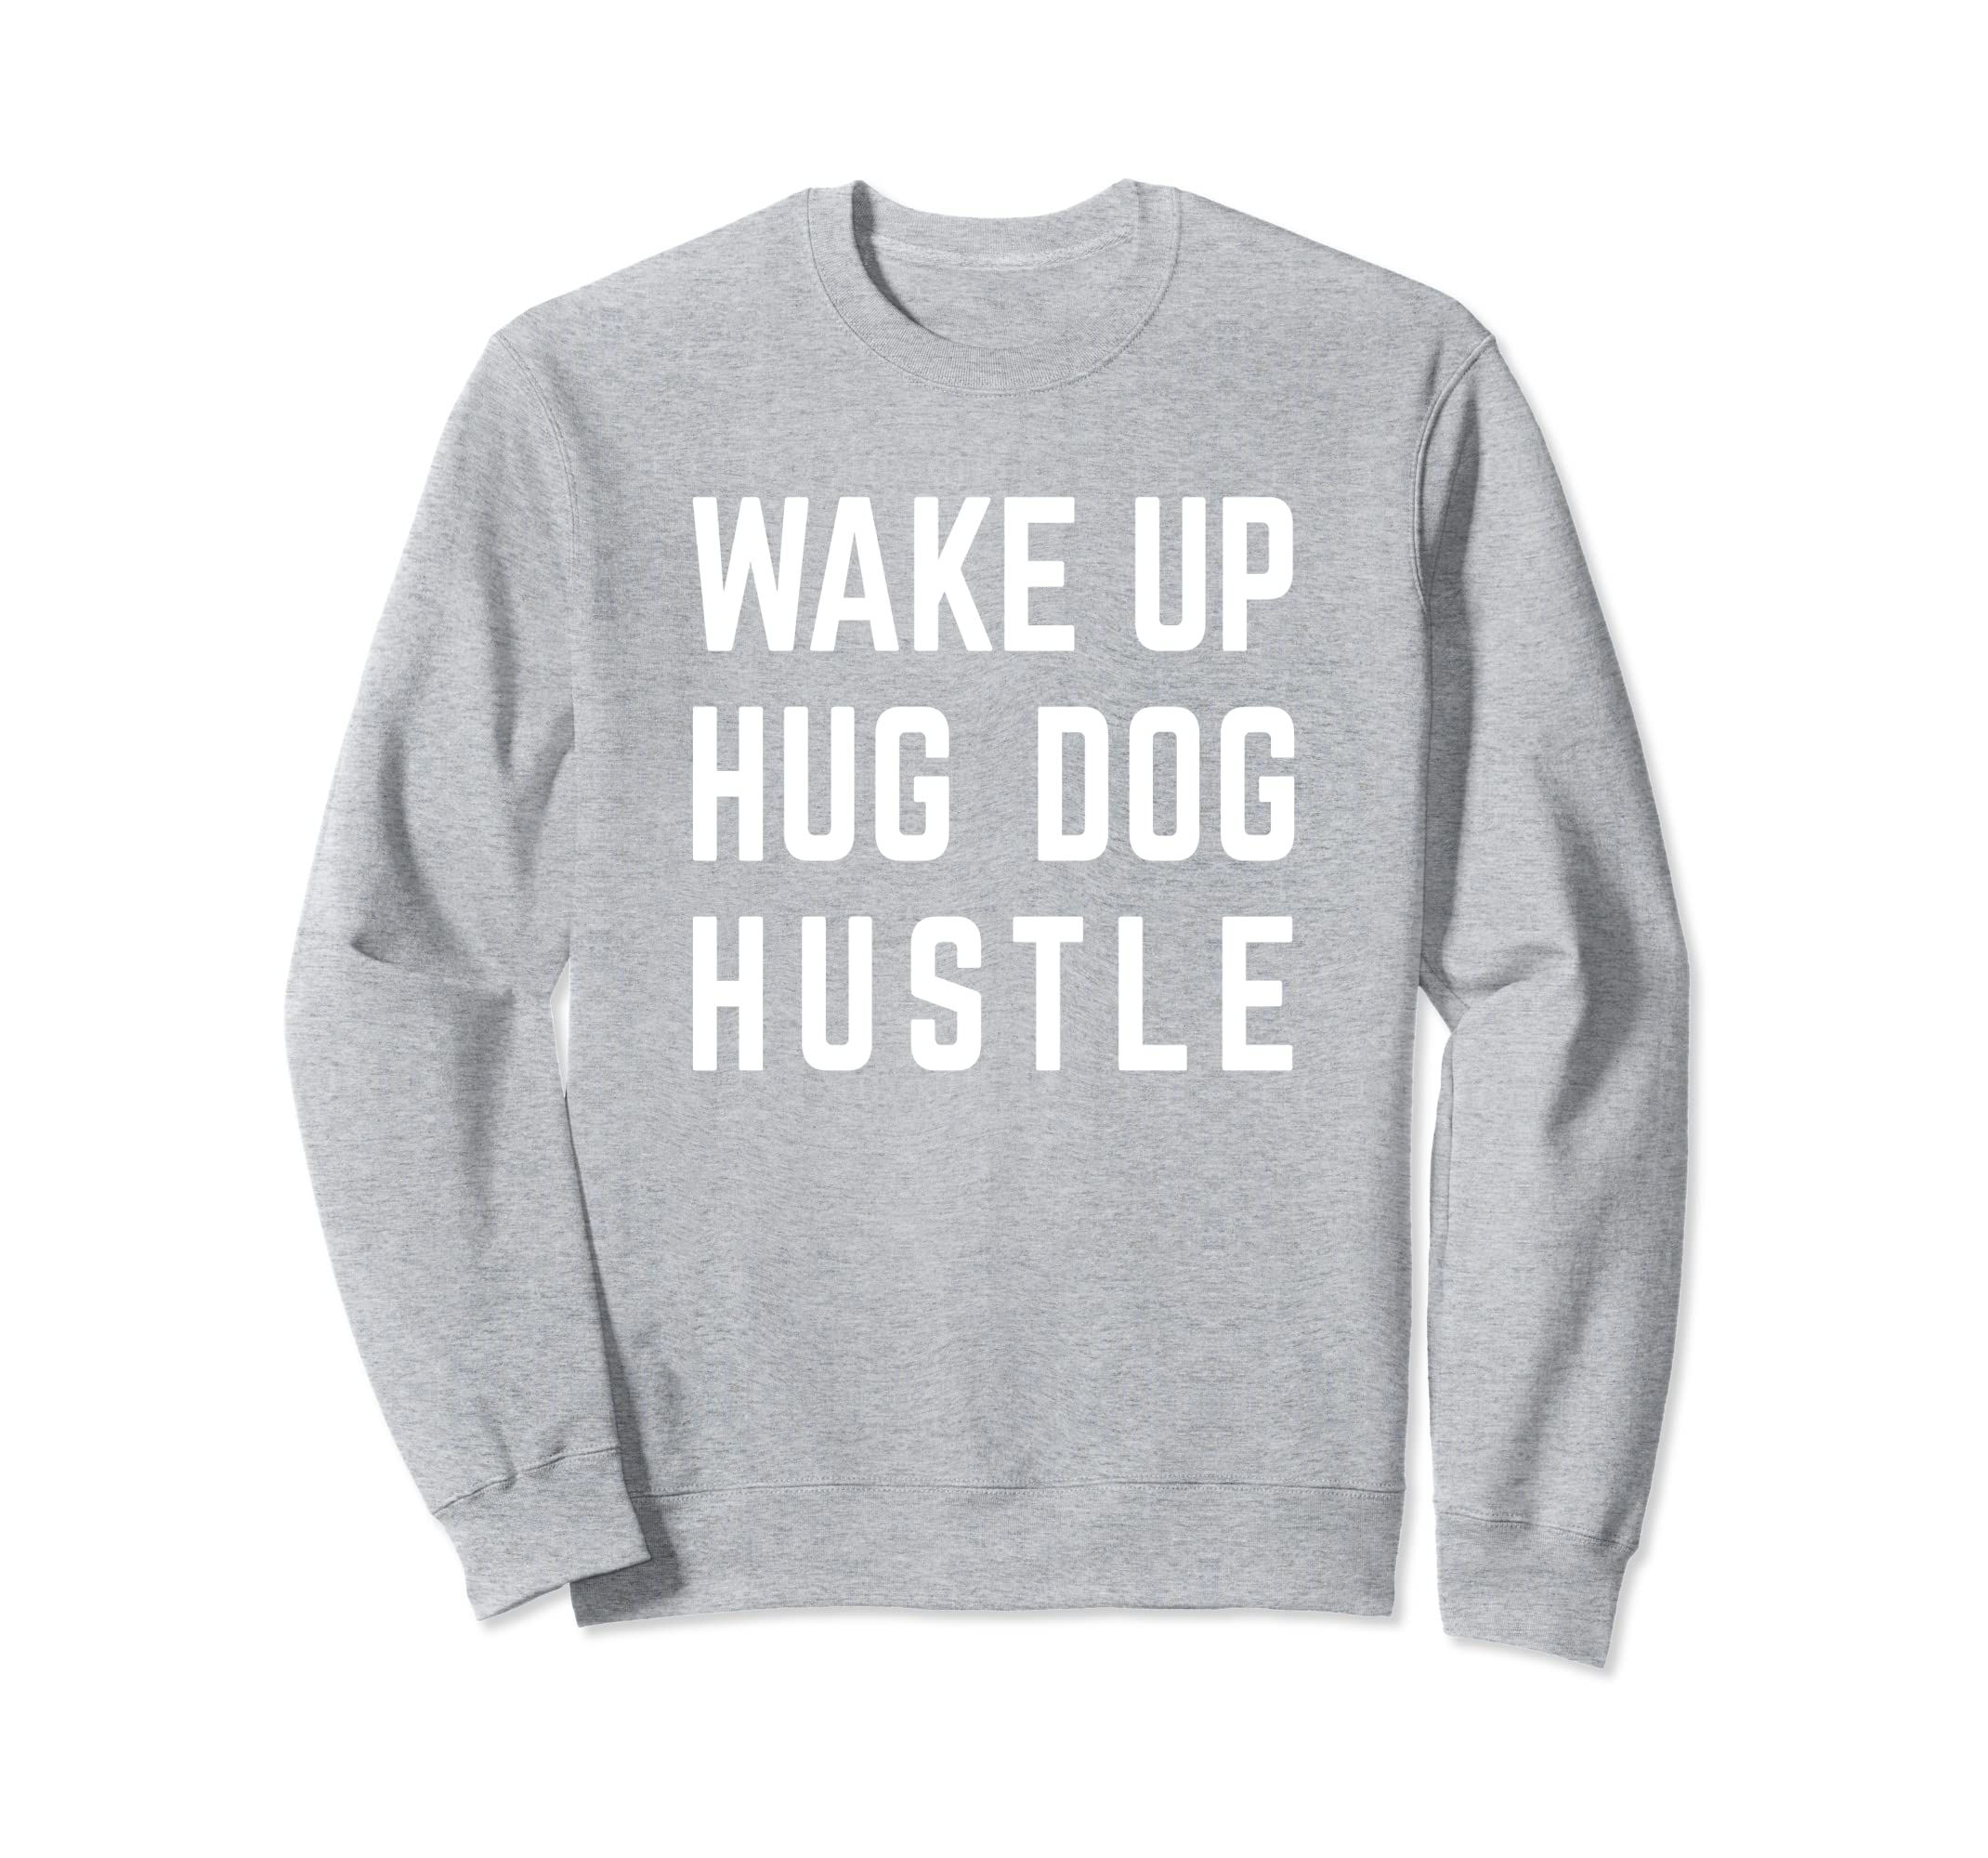 Amazoncom Funny Wake Up Hug Dog Hustle Sweatshirt For Dog Lovers